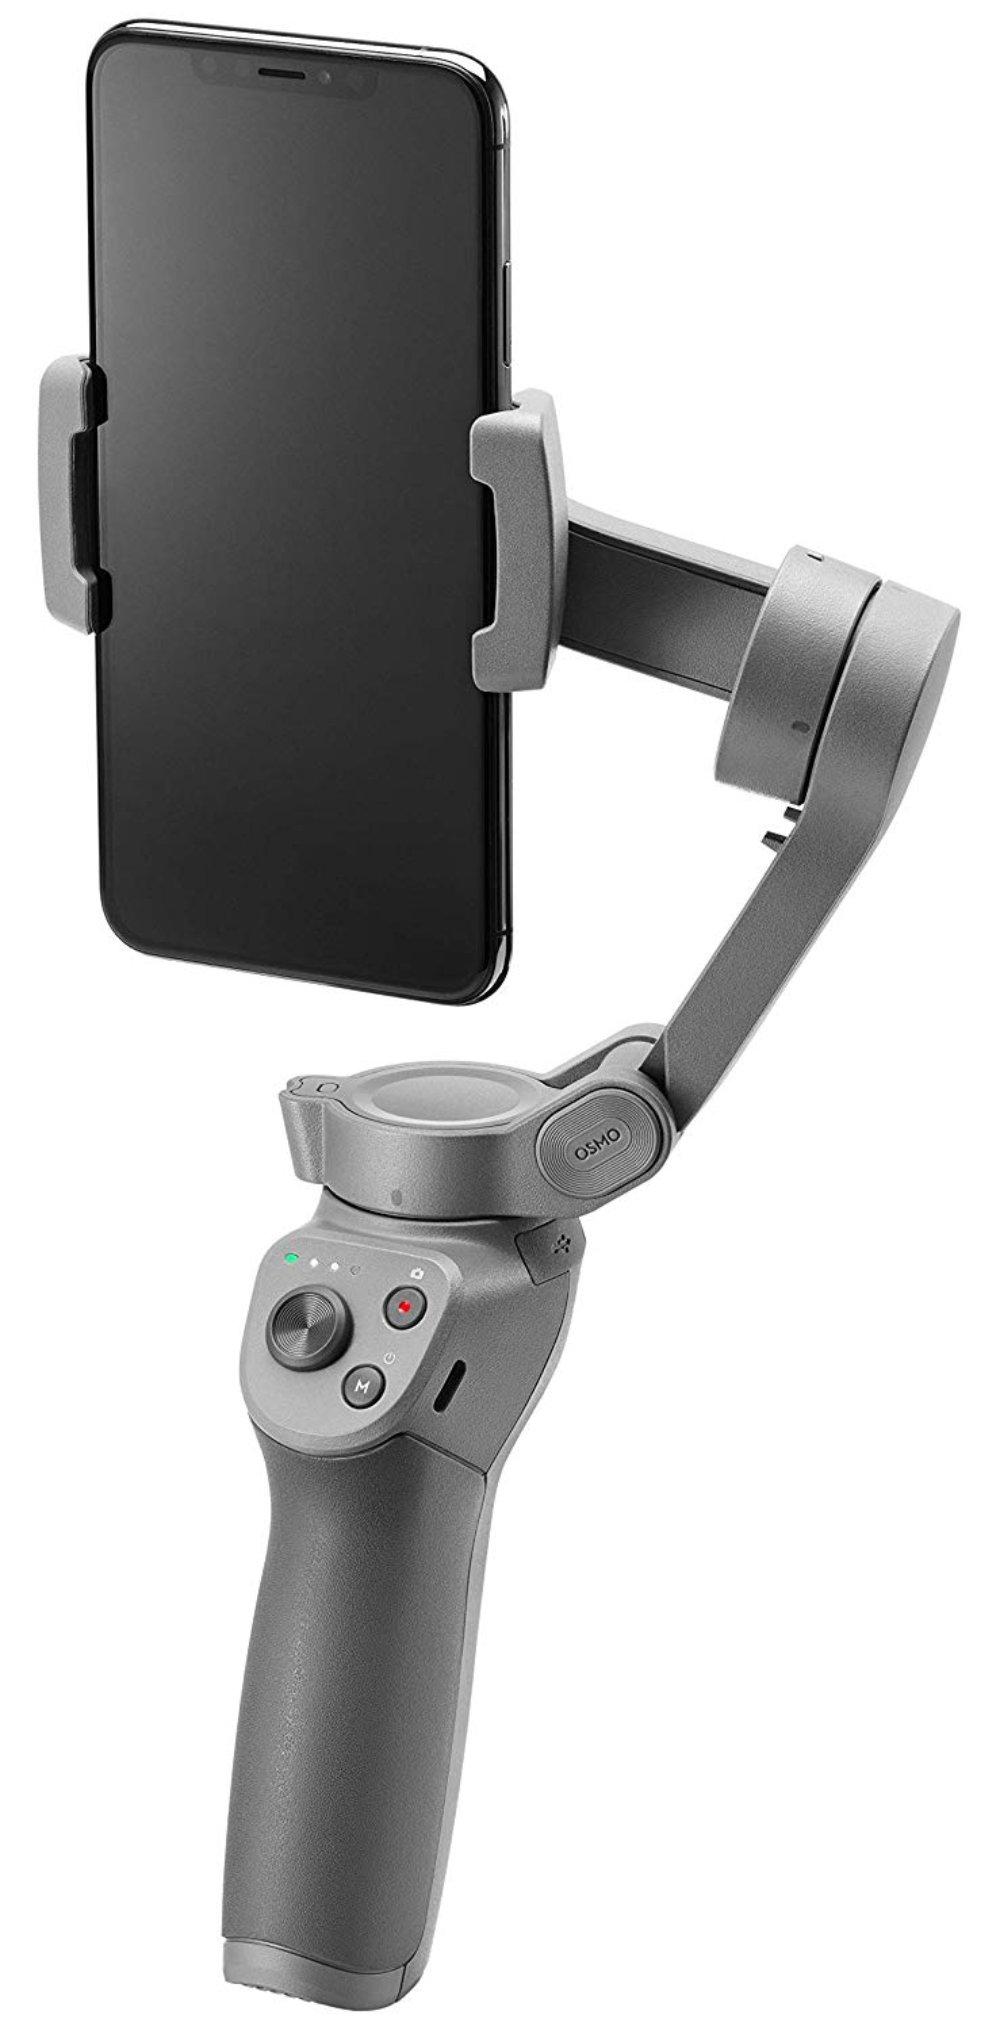 DJI OSMO Handheld Stabilizer